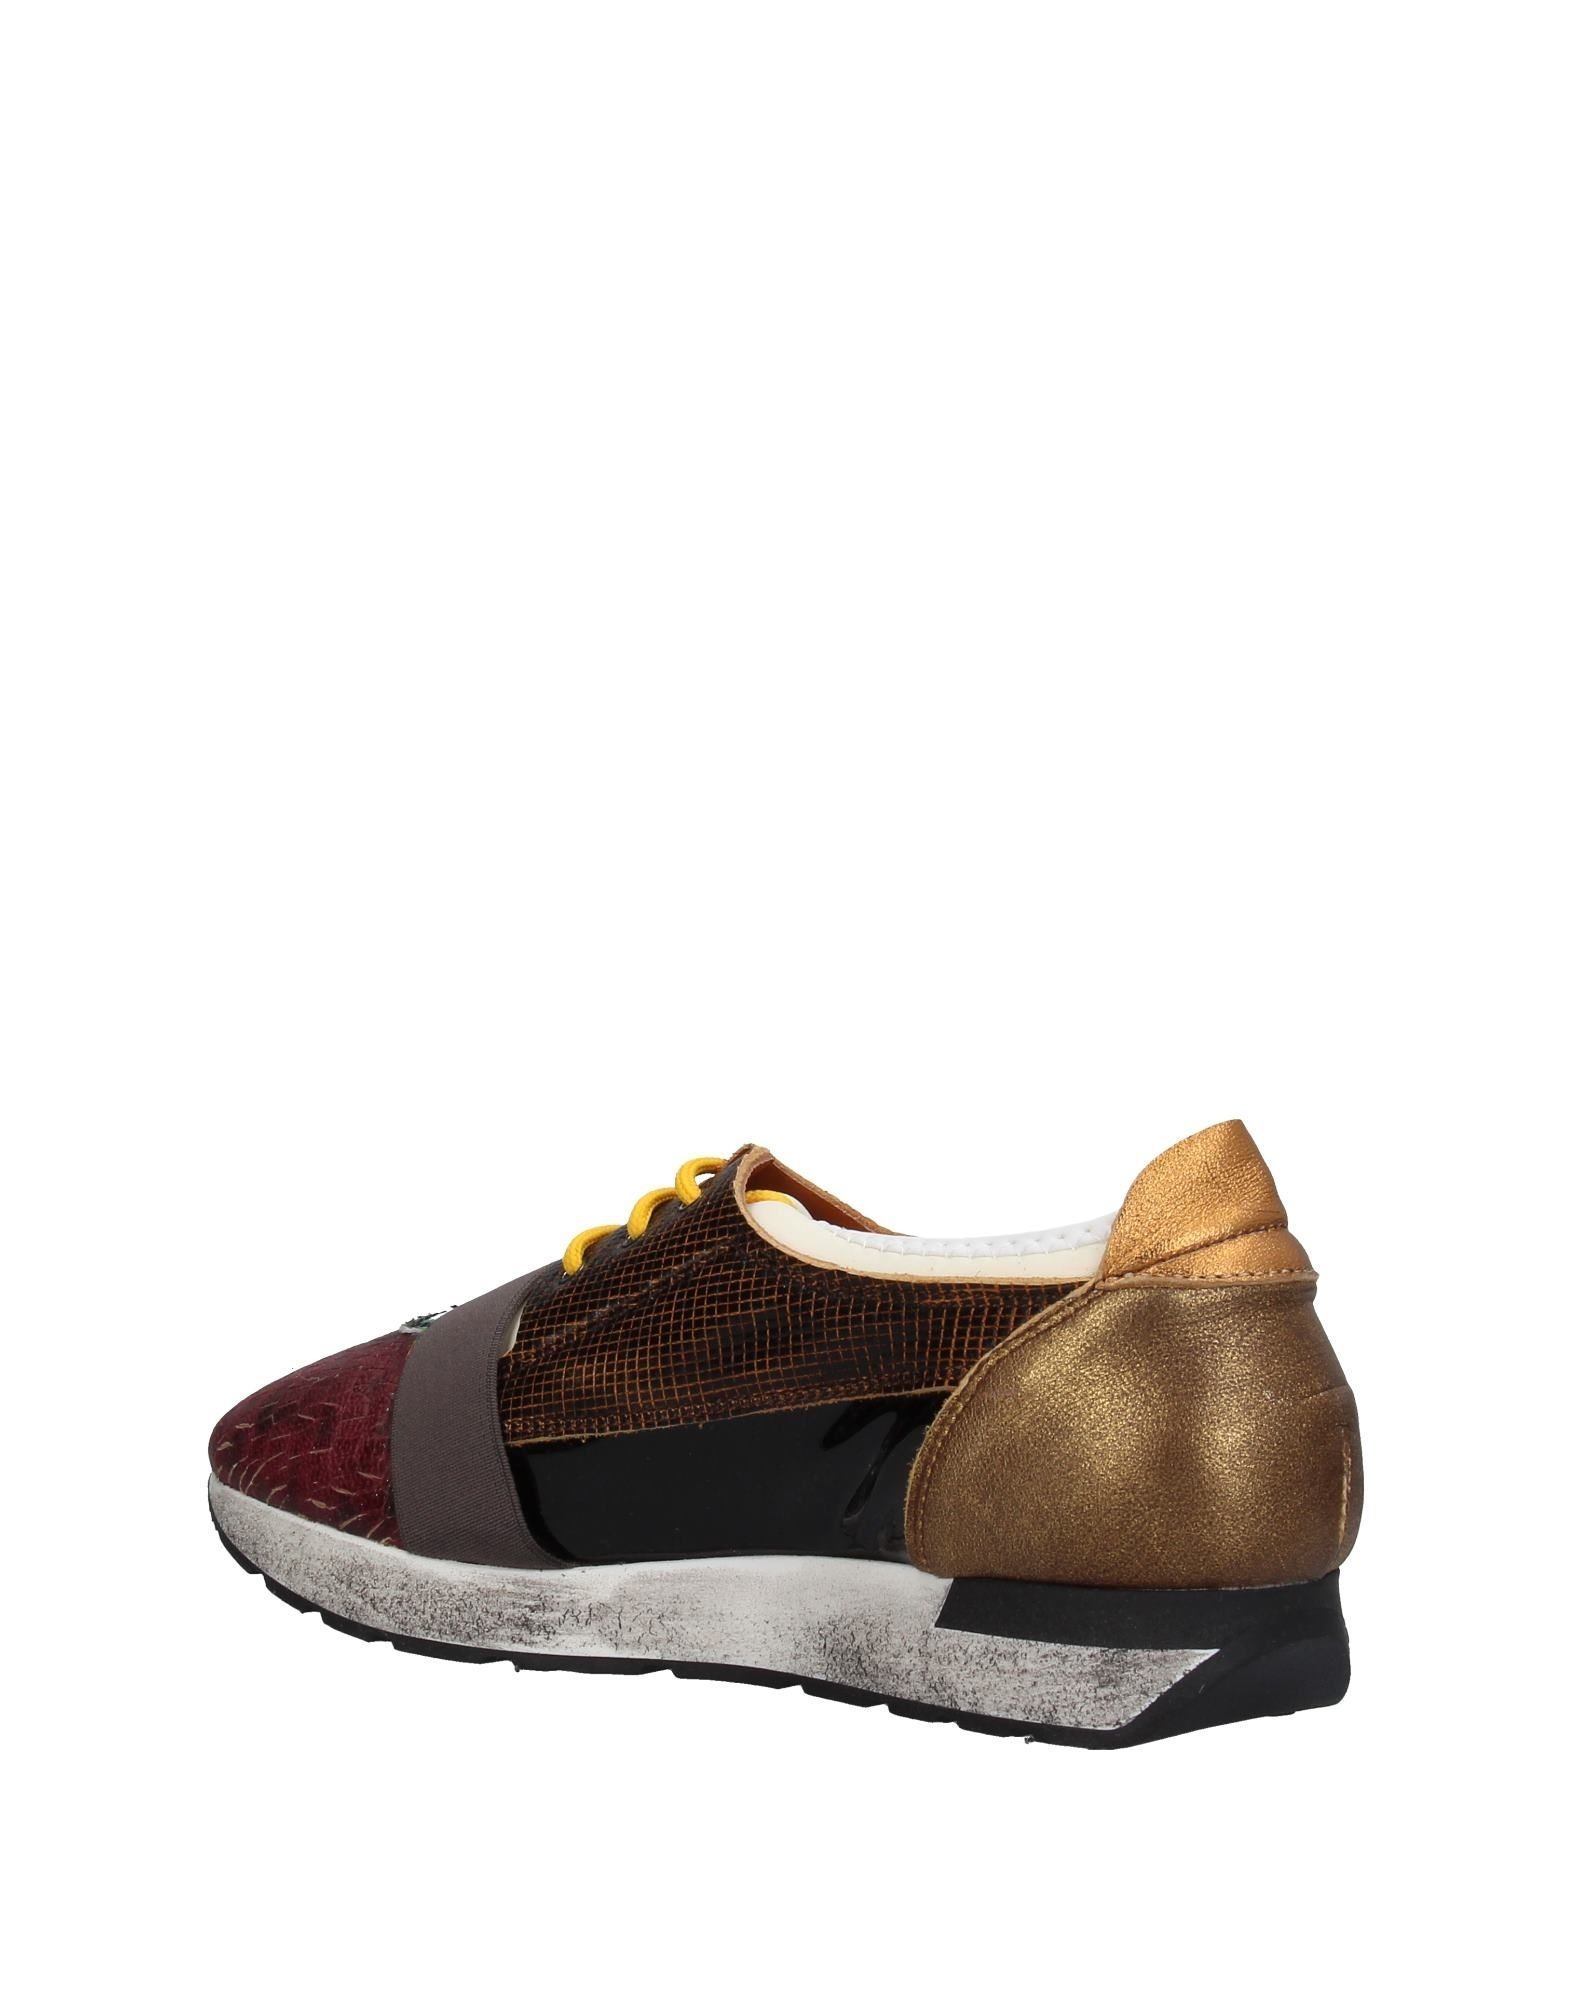 Ebarrito Gute Sneakers Damen  11396437KD Gute Ebarrito Qualität beliebte Schuhe 3e091c